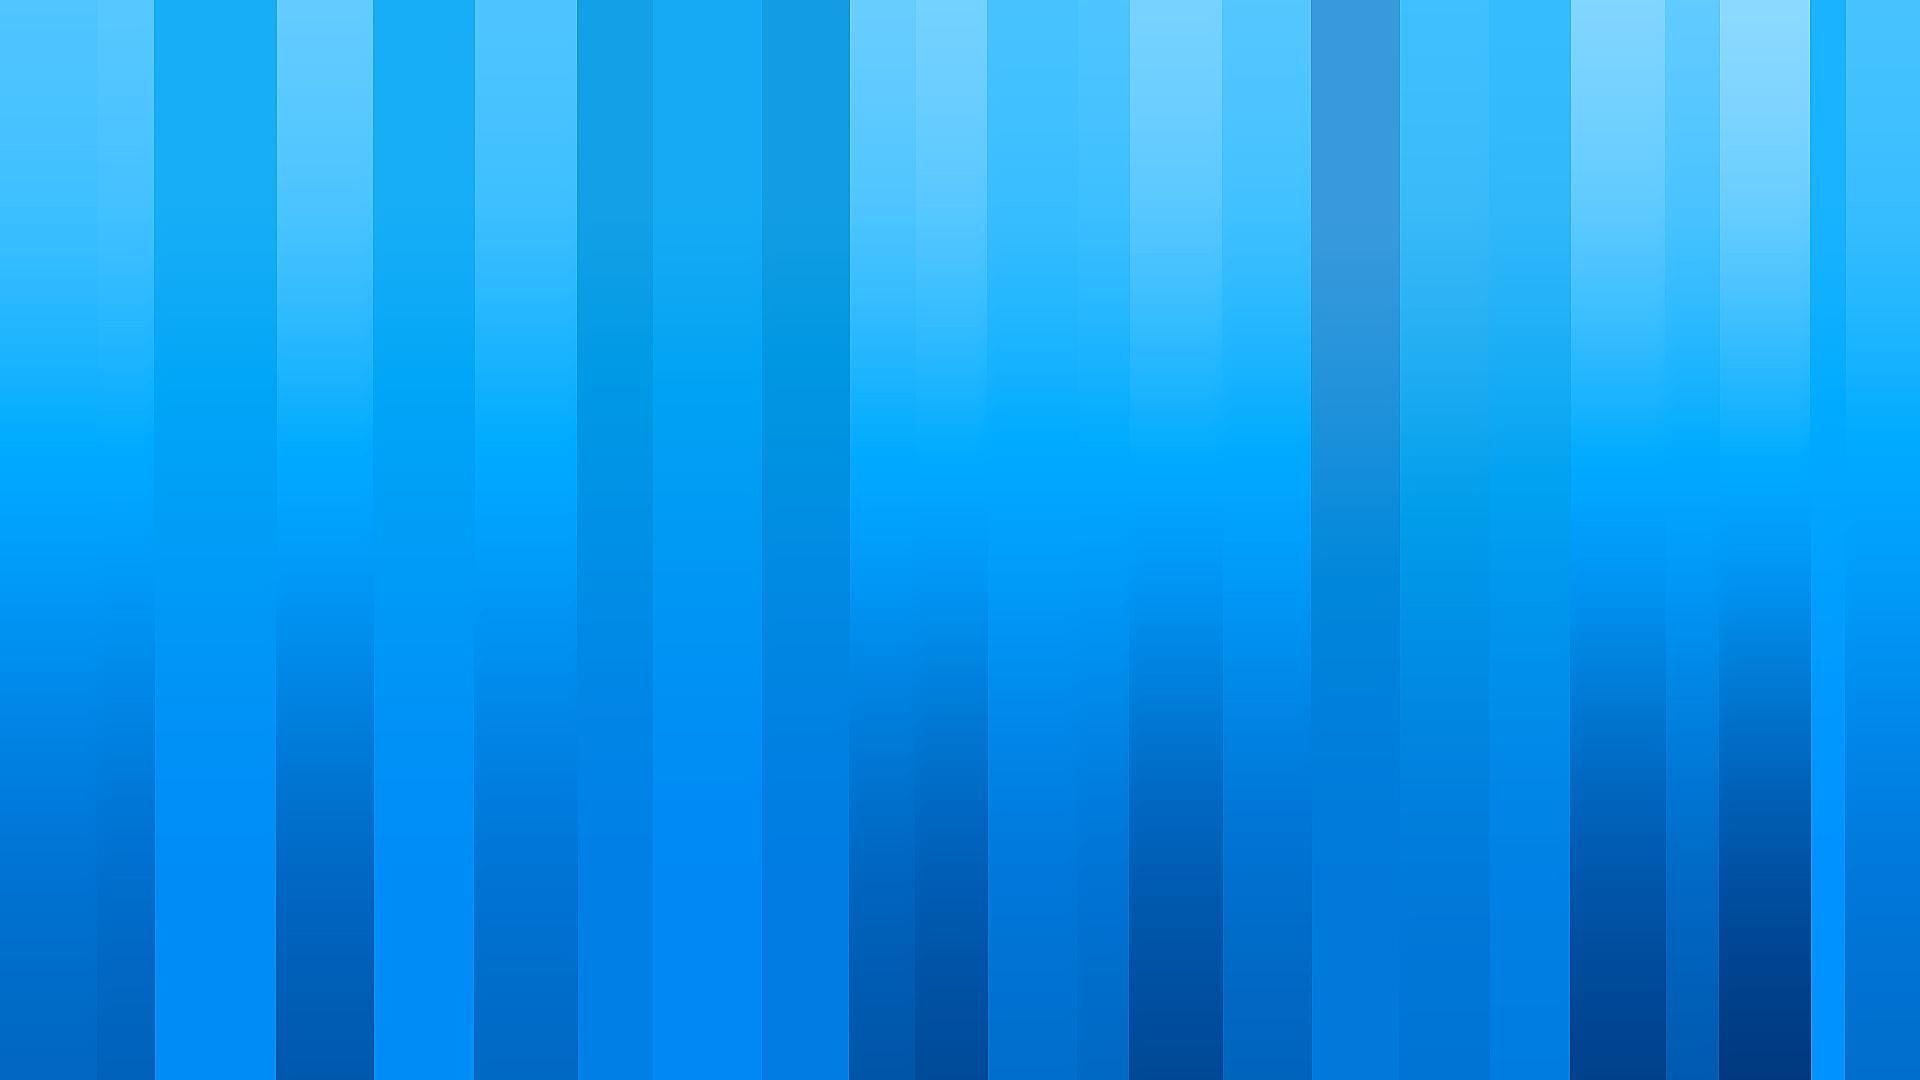 Blue light stripes wallpaper by msagovac on DeviantArt